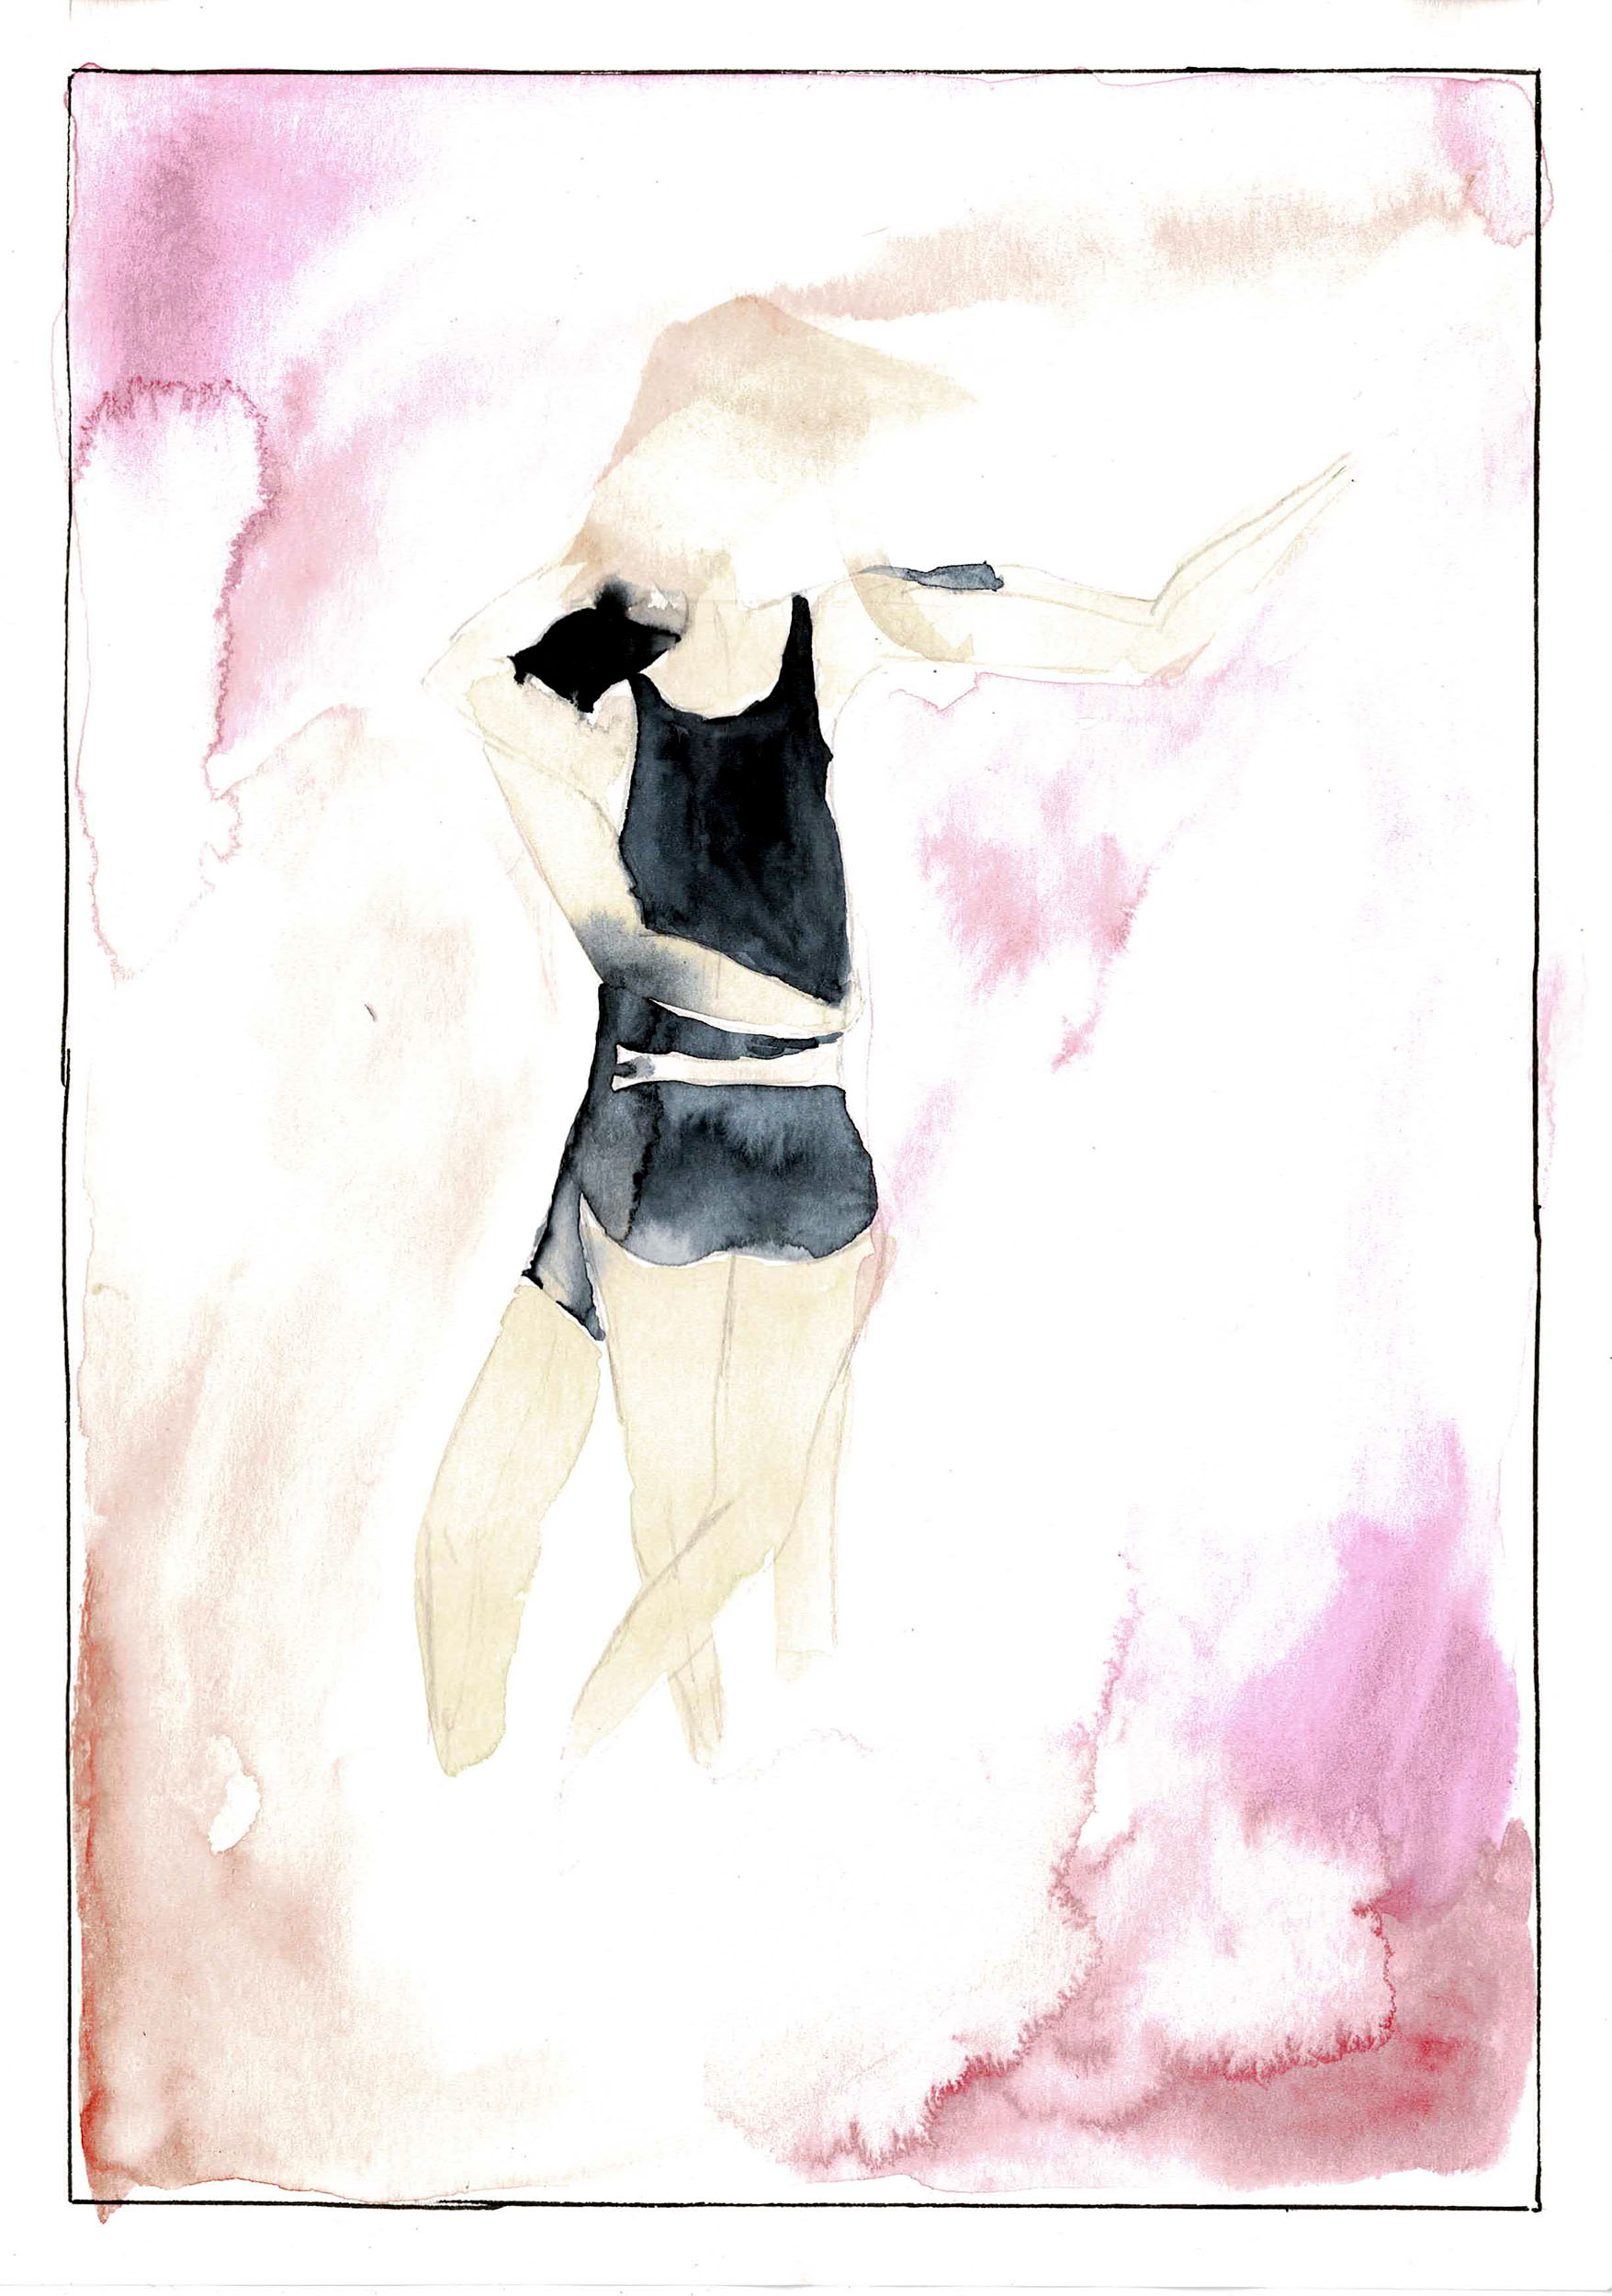 Isabel_Vidal_Sola_Dance_me_0002_Capa 1